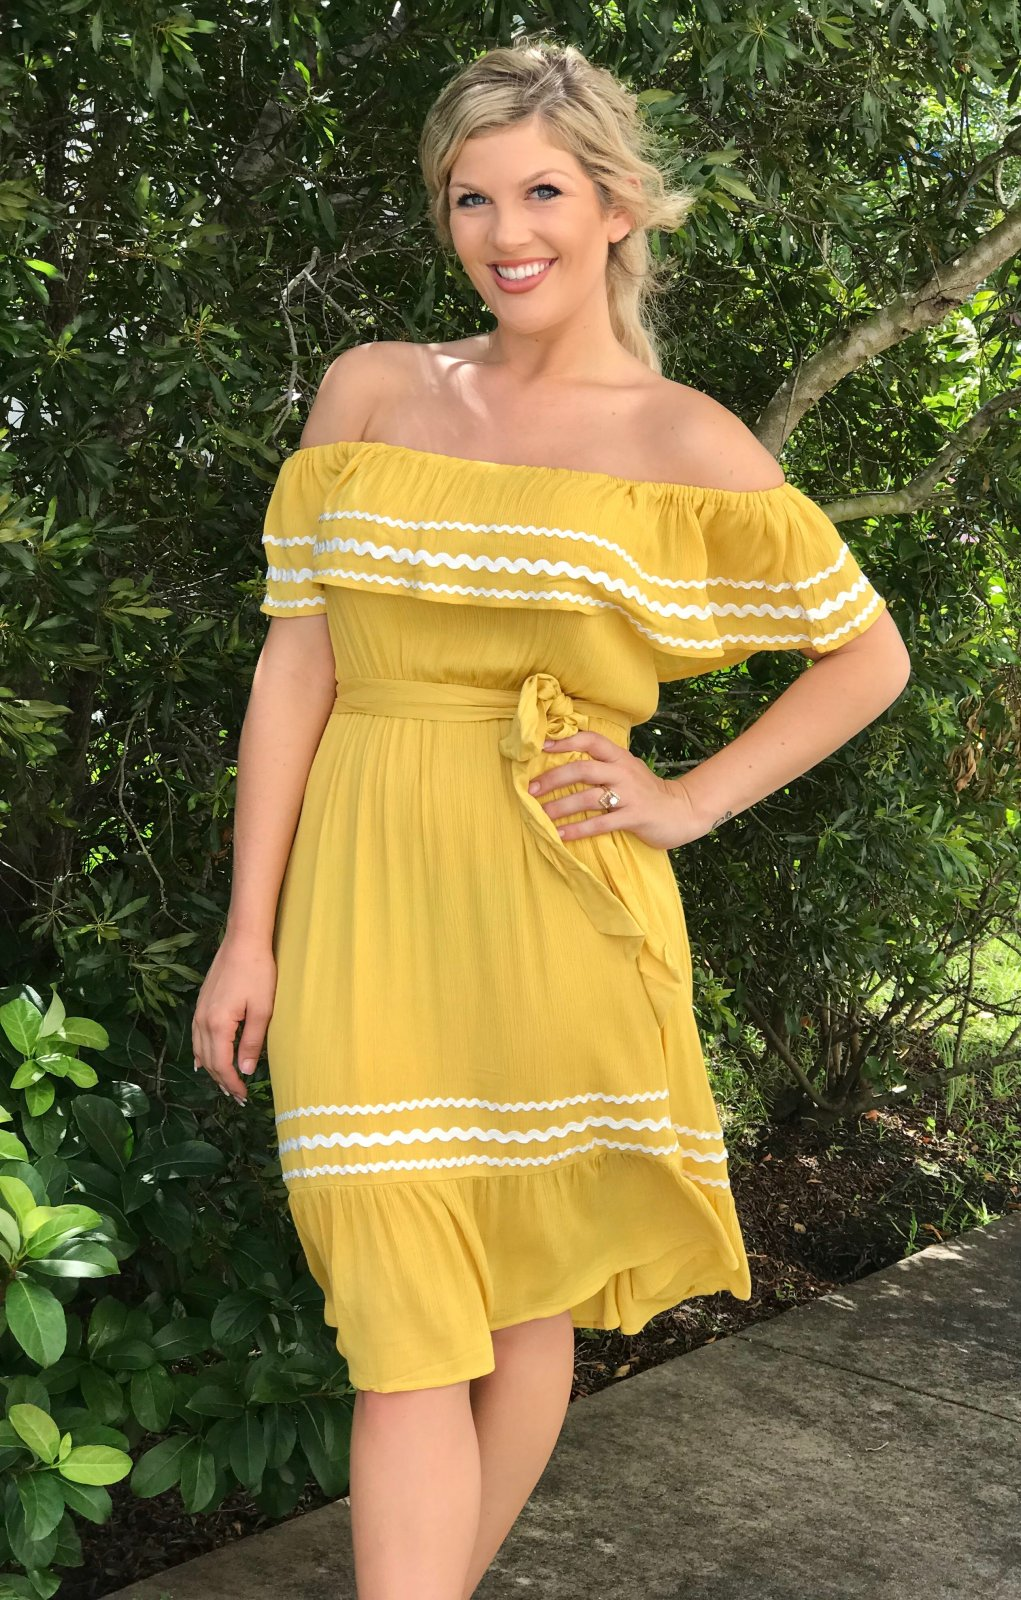 Senorita Yellow Dress